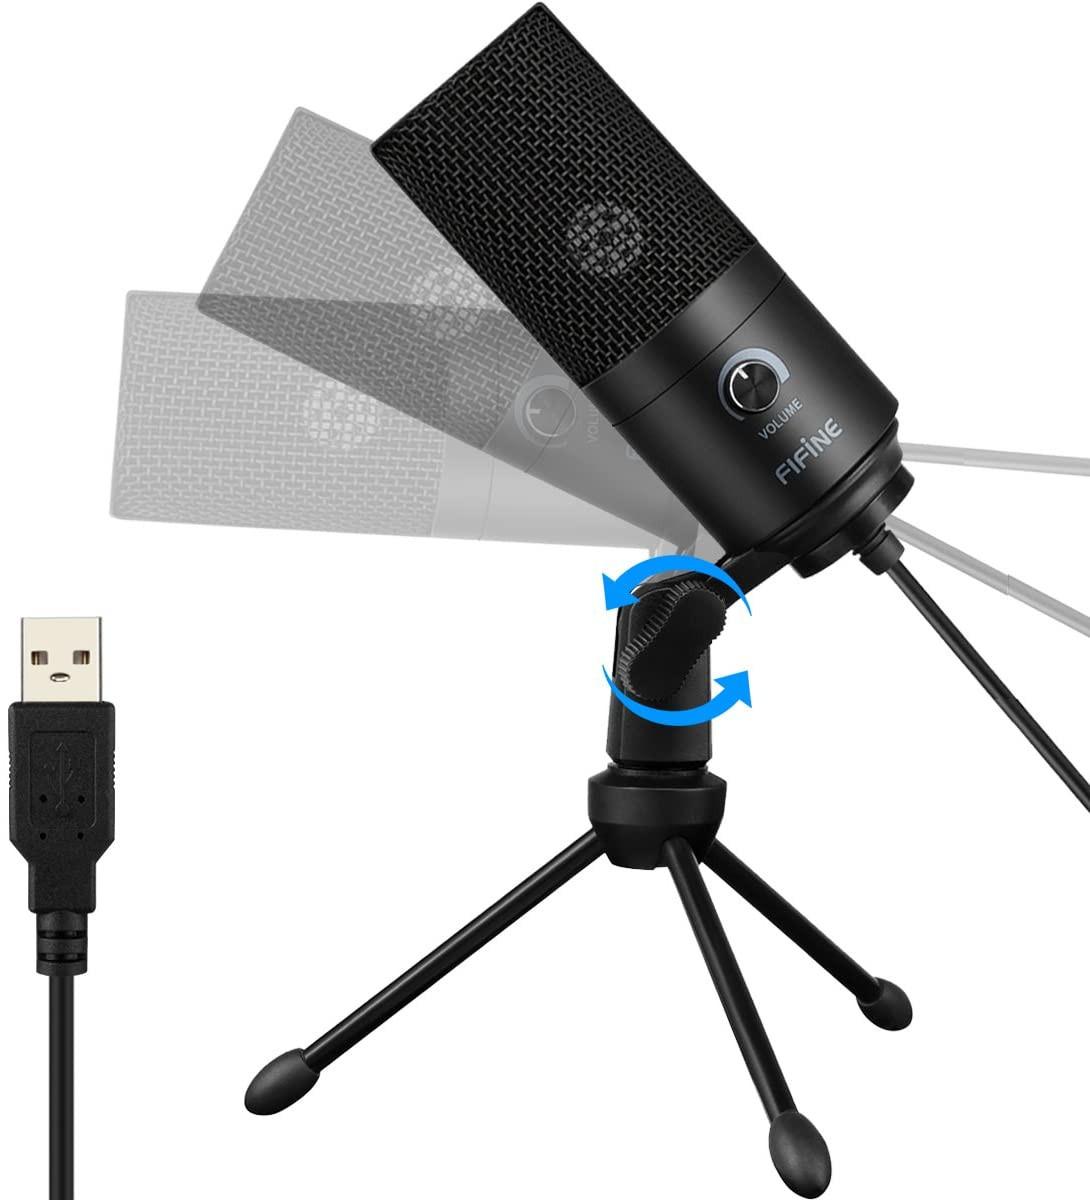 фото мини штатива на стол для микрофона Fifine K669B